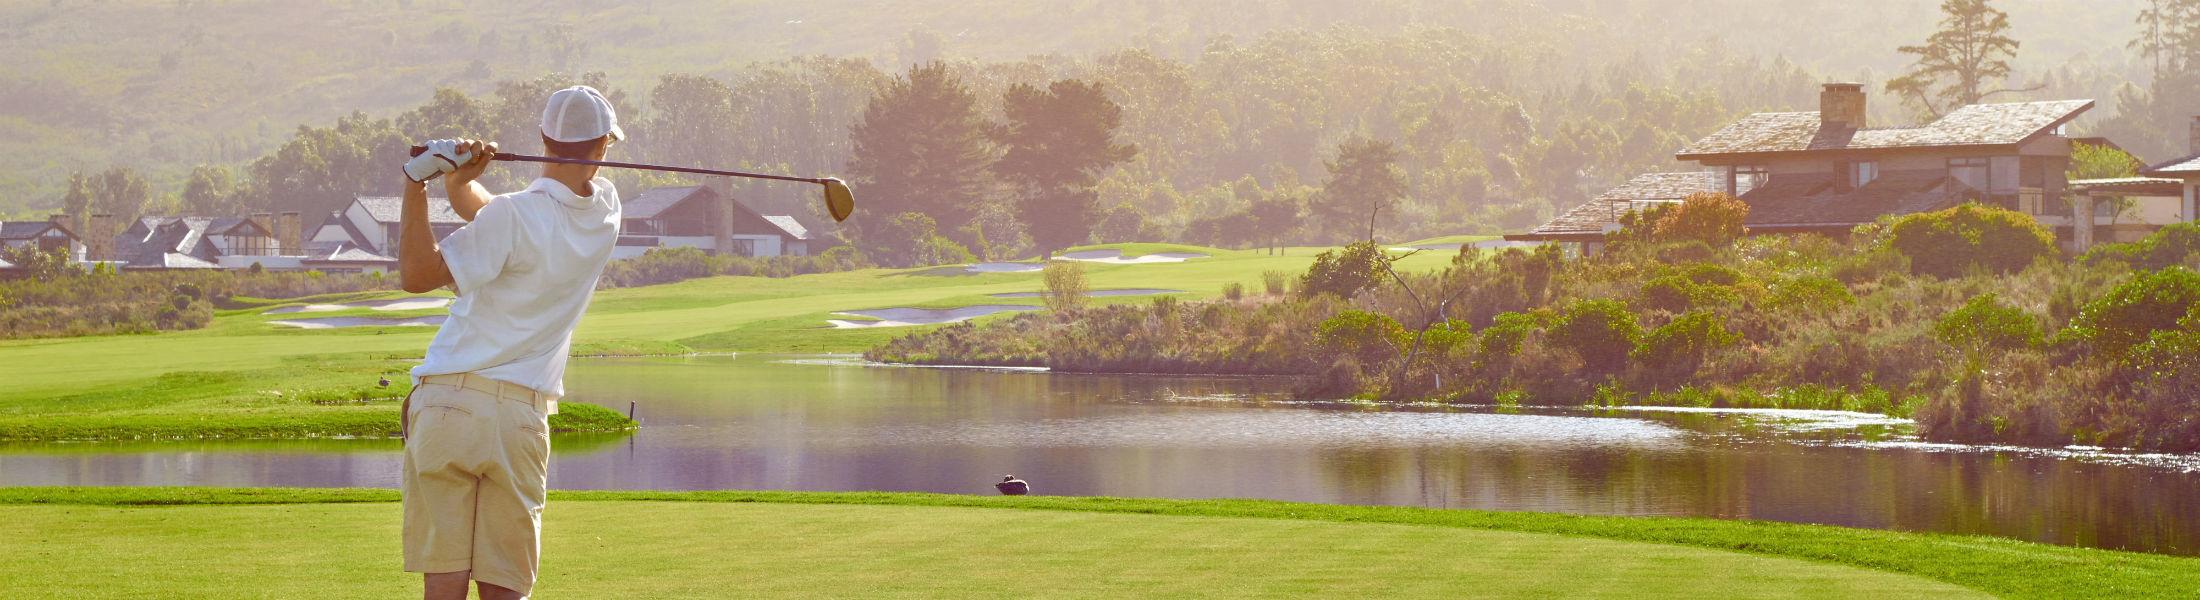 golf shot with club on summer